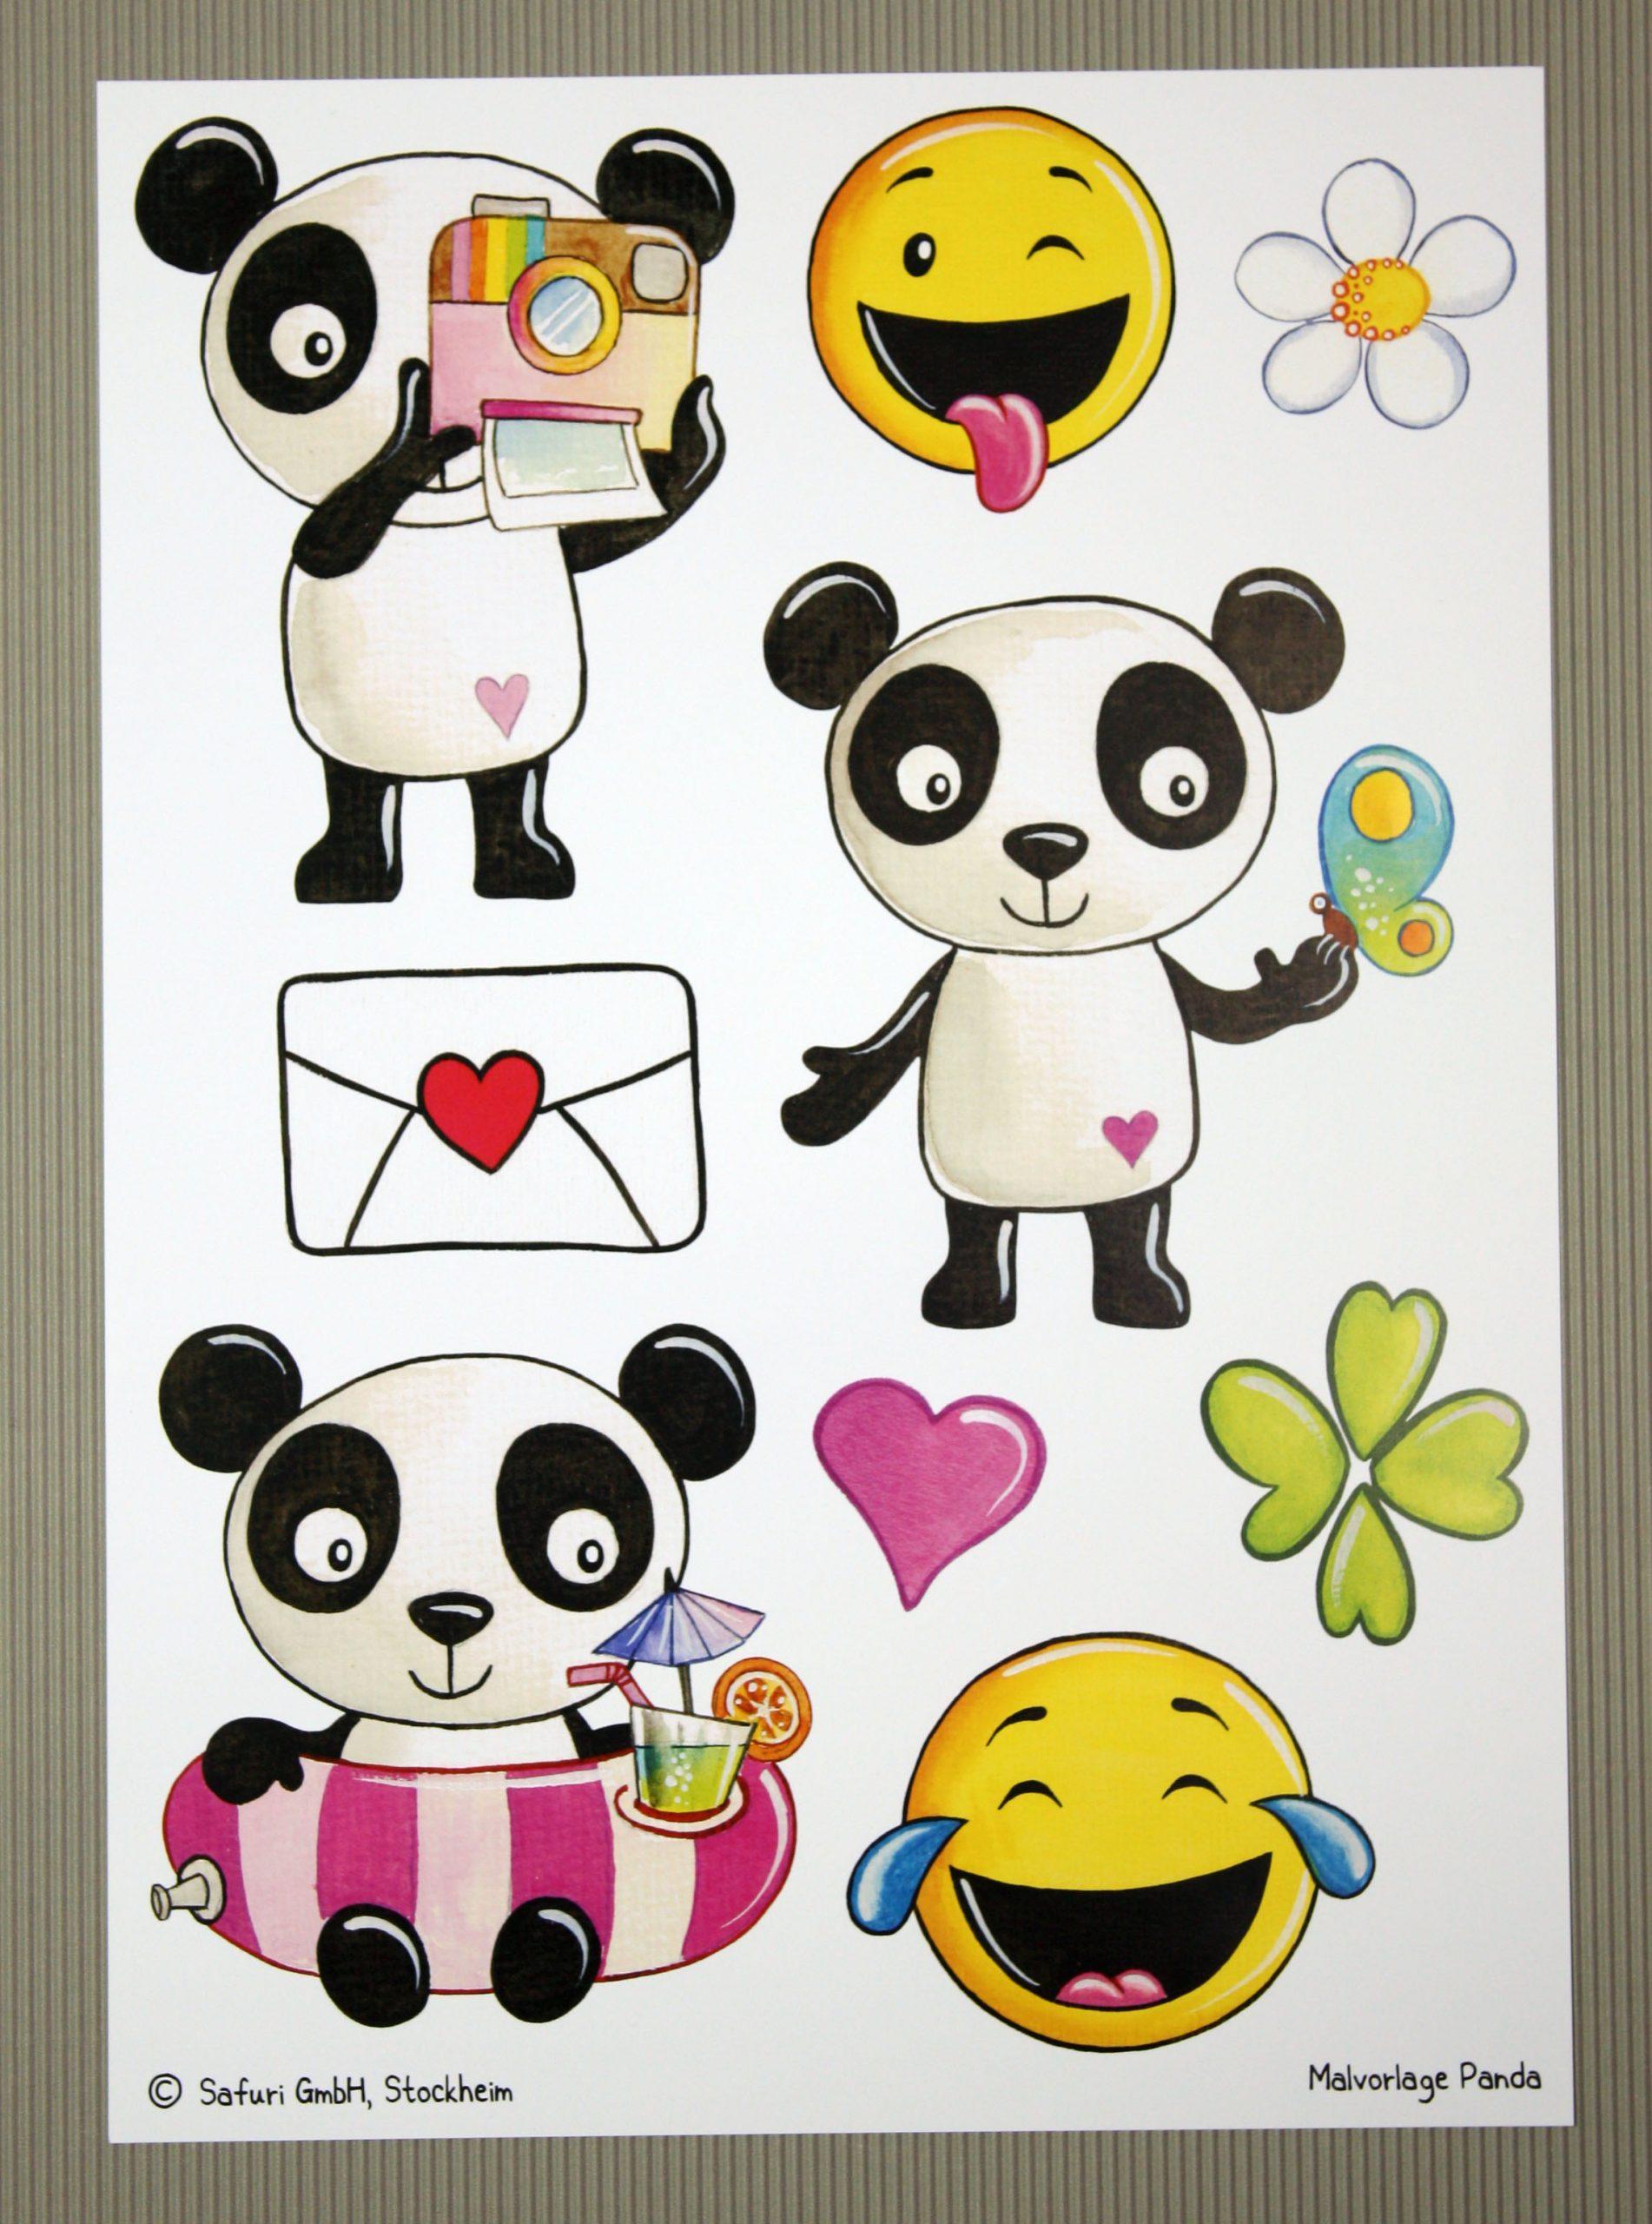 schrimpiset 5 panda  safuri gmbh onlineshop